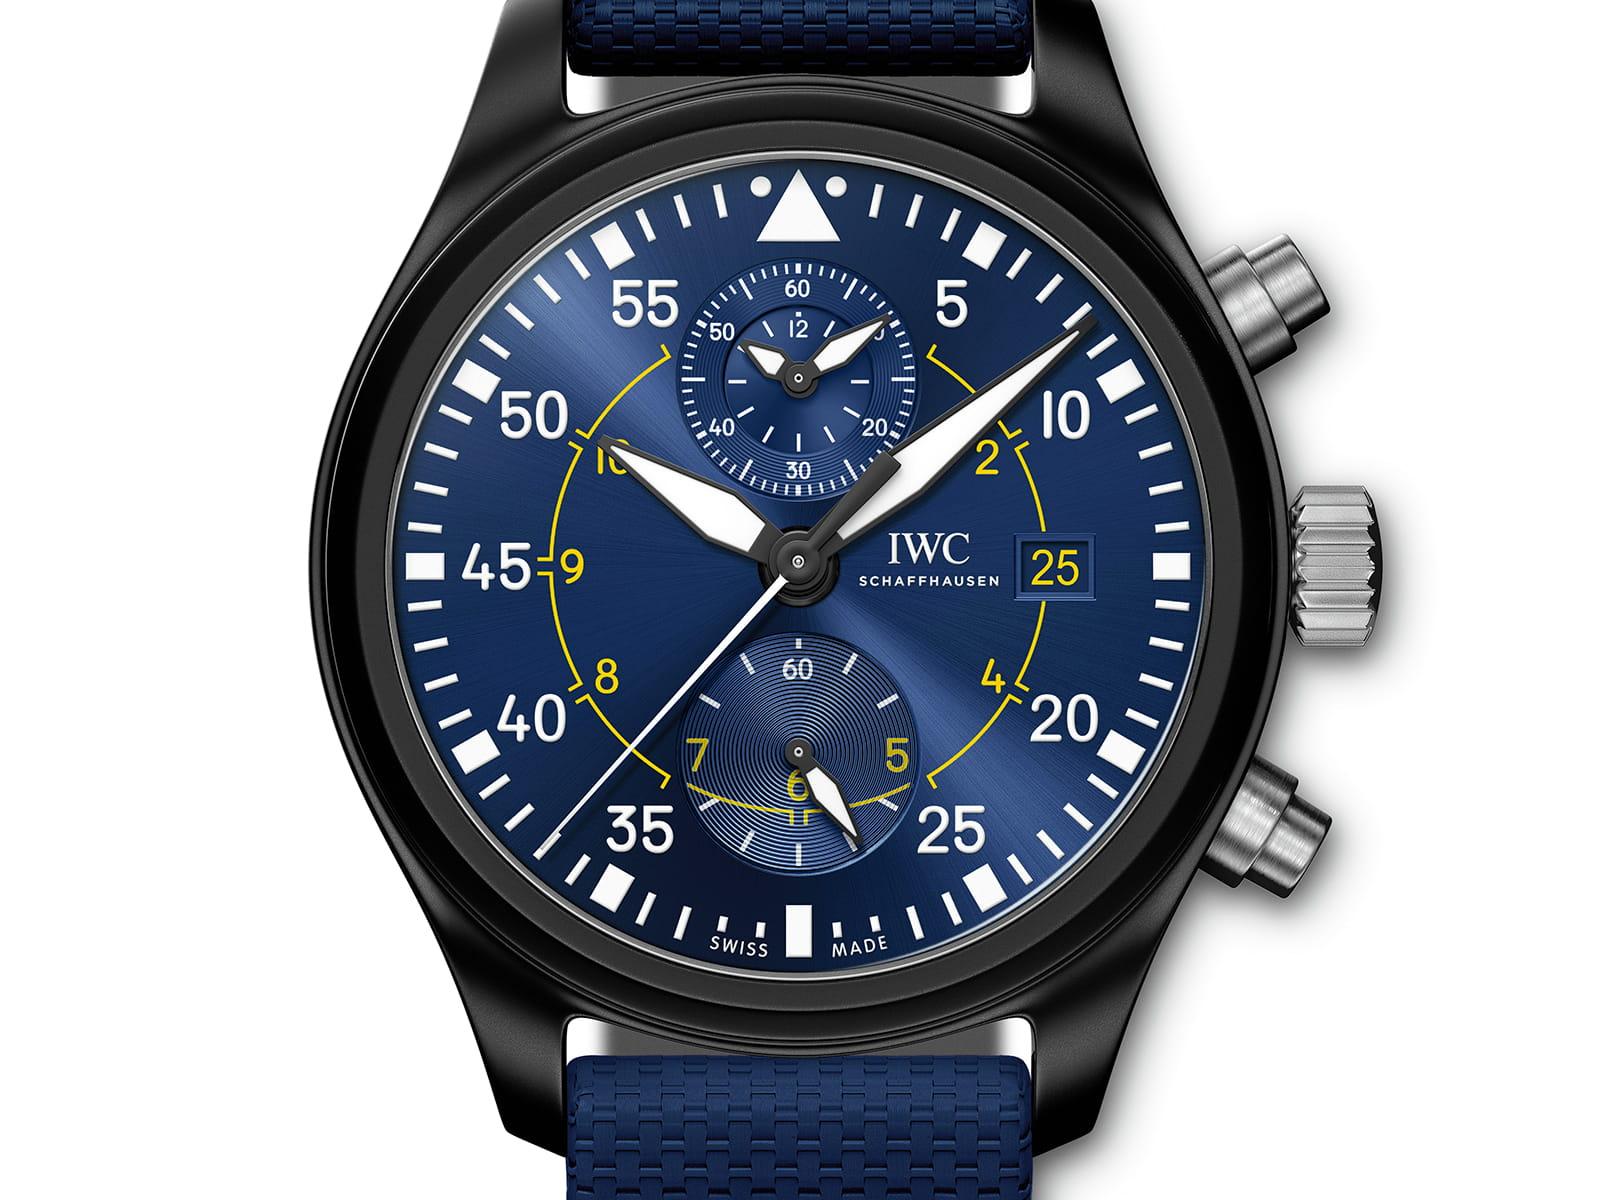 iw389008-iwc-schaffhausen-pilot-s-watch-chronograph-edition-blue-angels-3.jpg